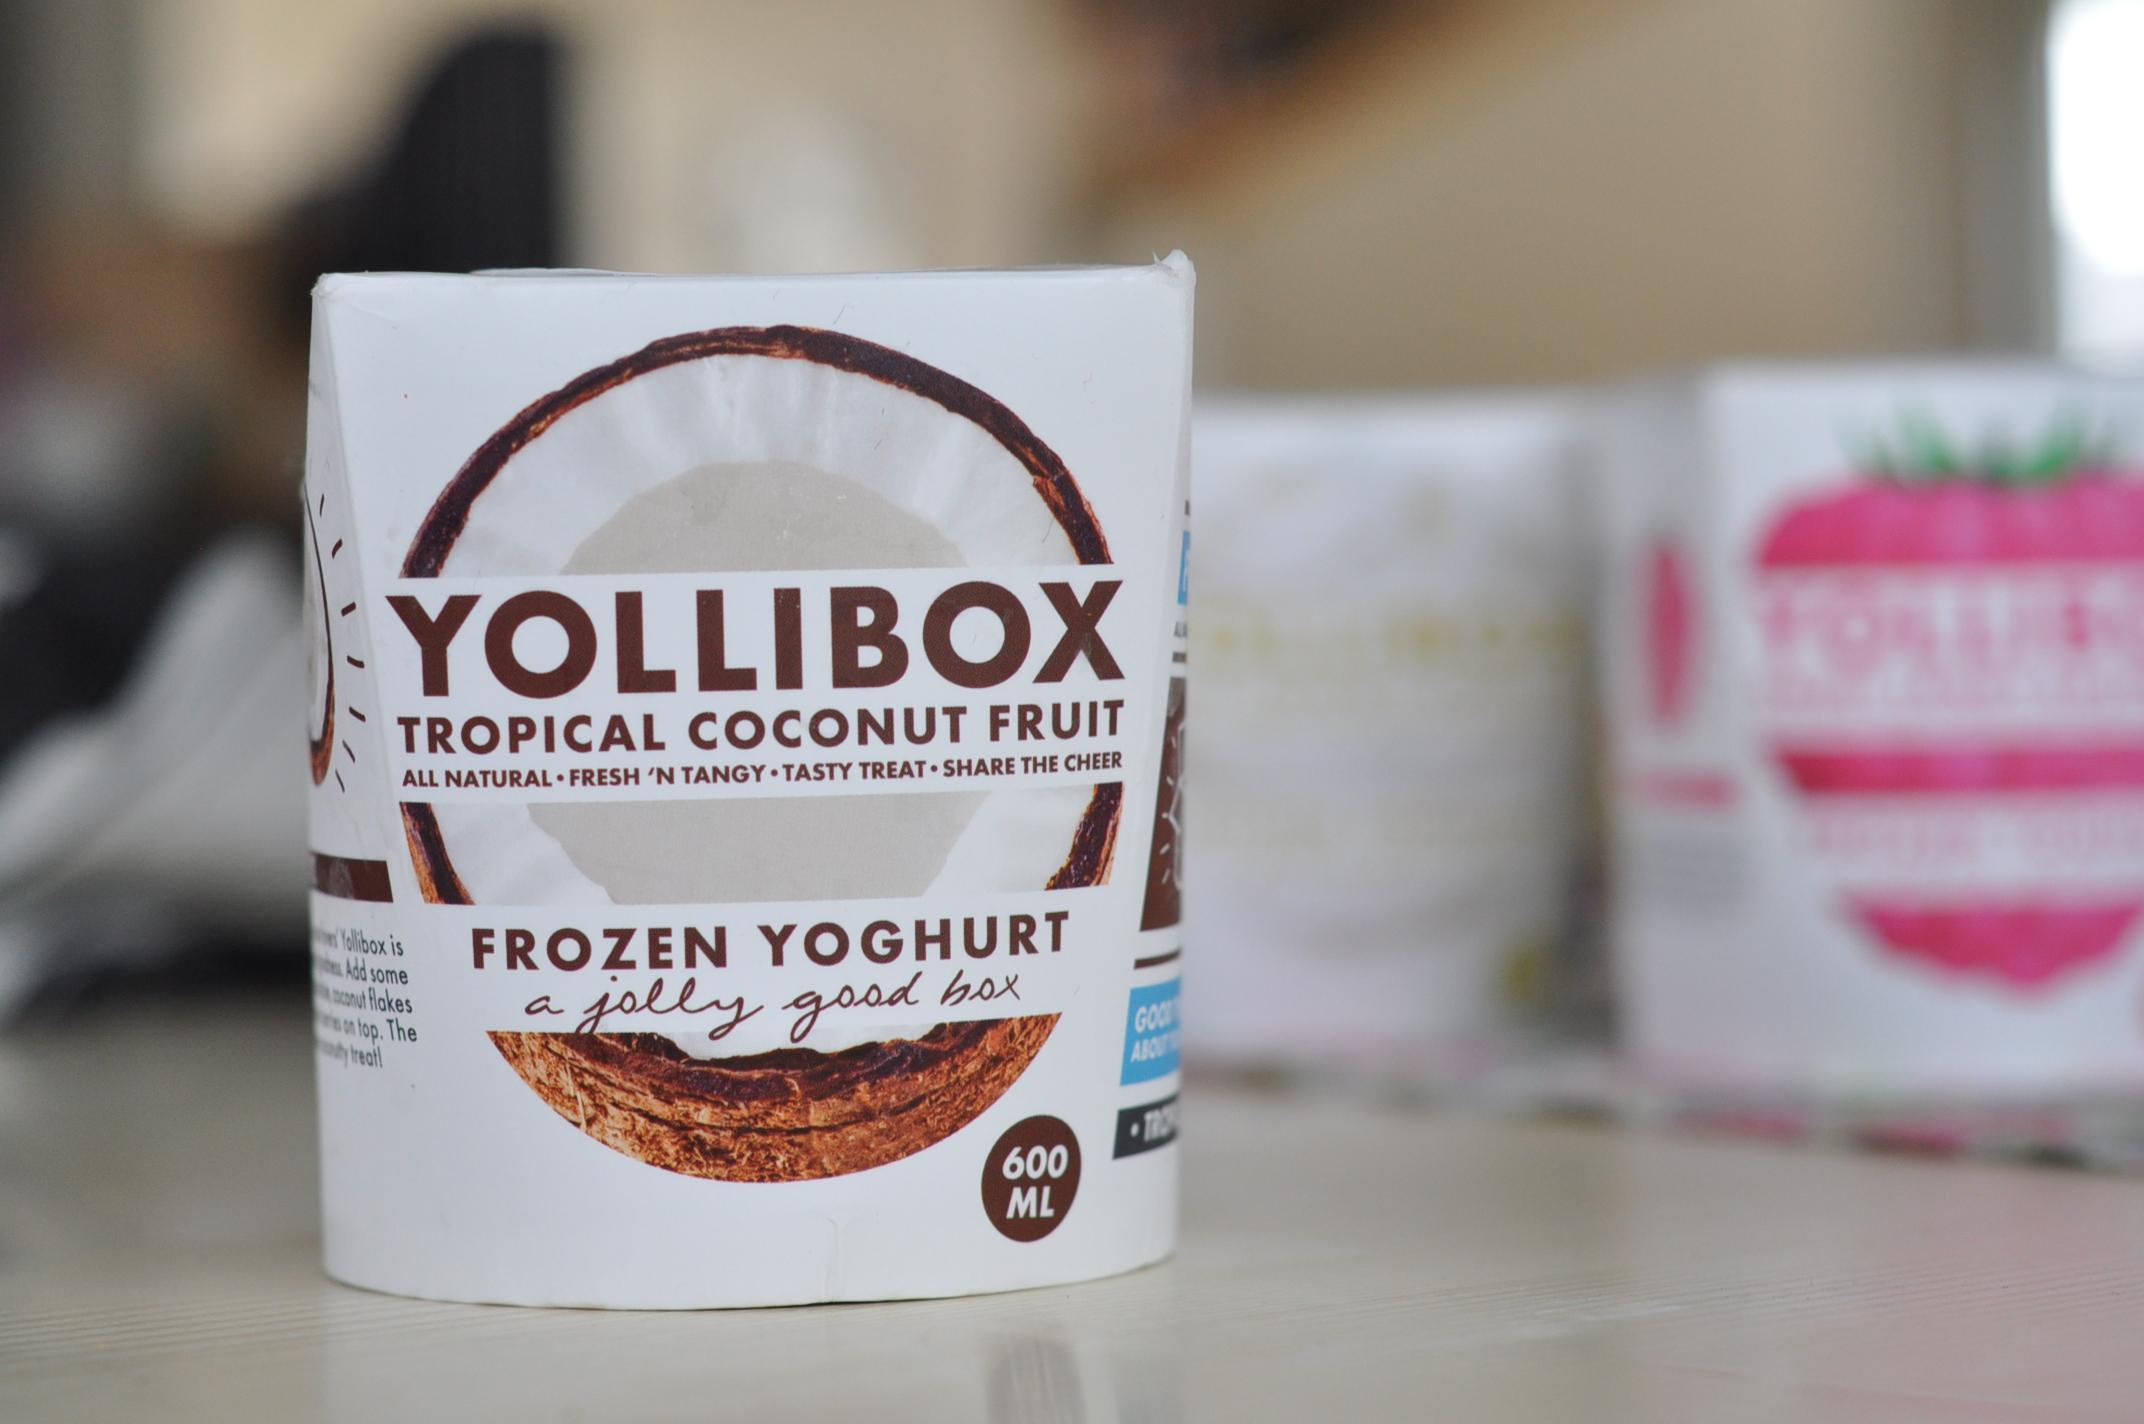 Yollibox Tropical Coconut Fruit